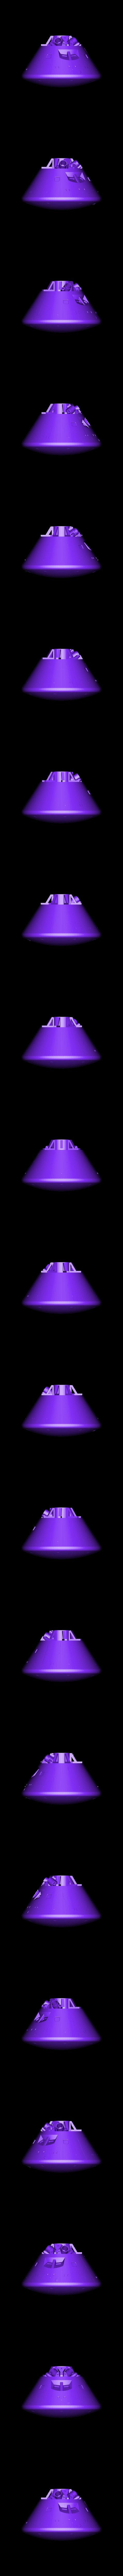 orion_nofbc.stl Download free STL file Orion Capsule • 3D printable design, spac3D